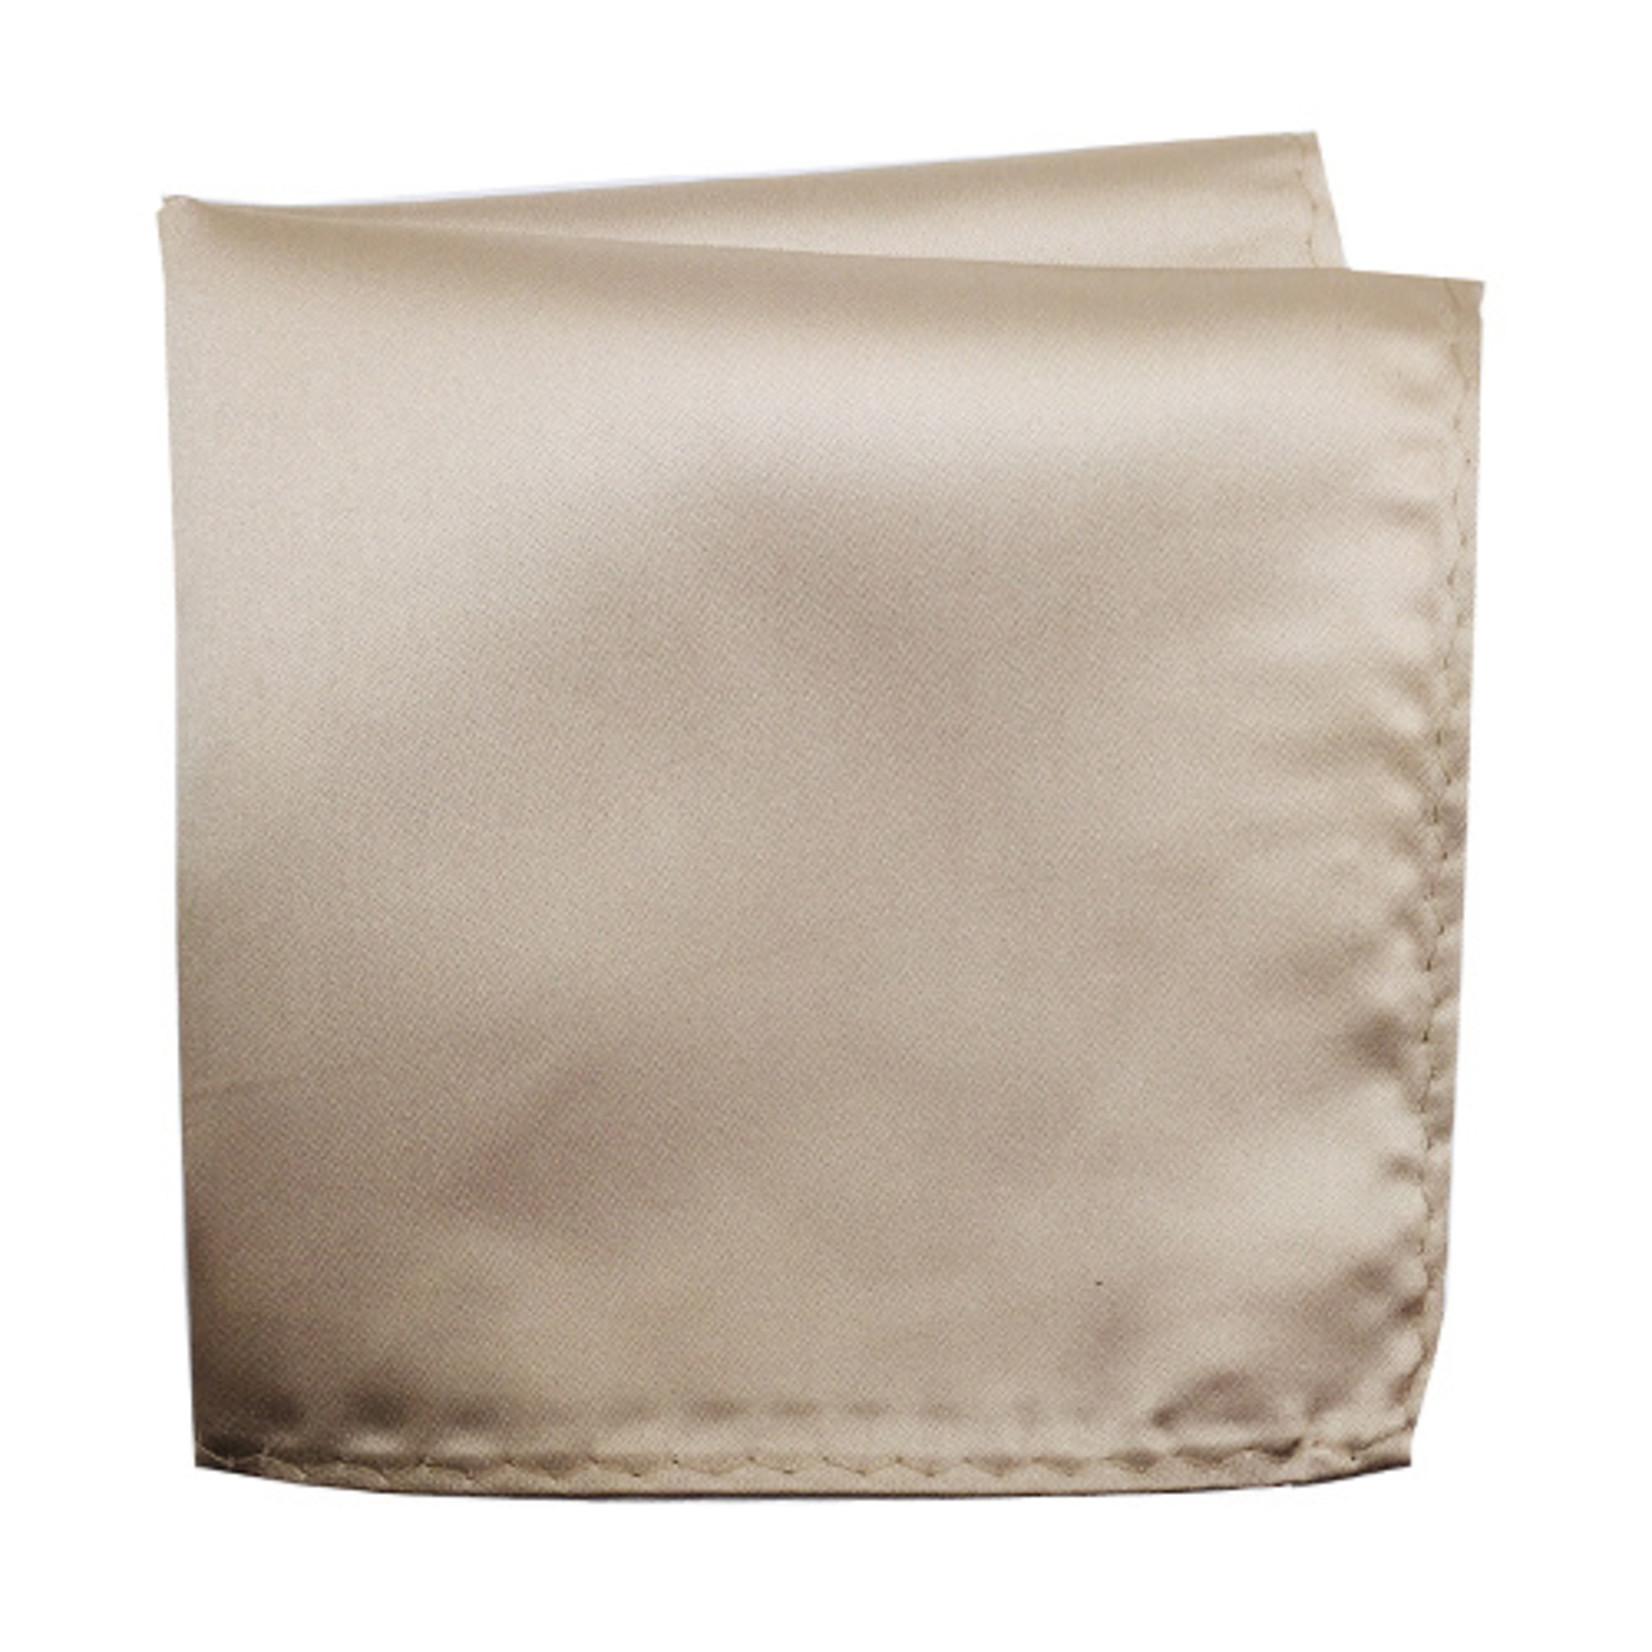 Knotz M100PSQ-56 Solid Champagne Pocket Square